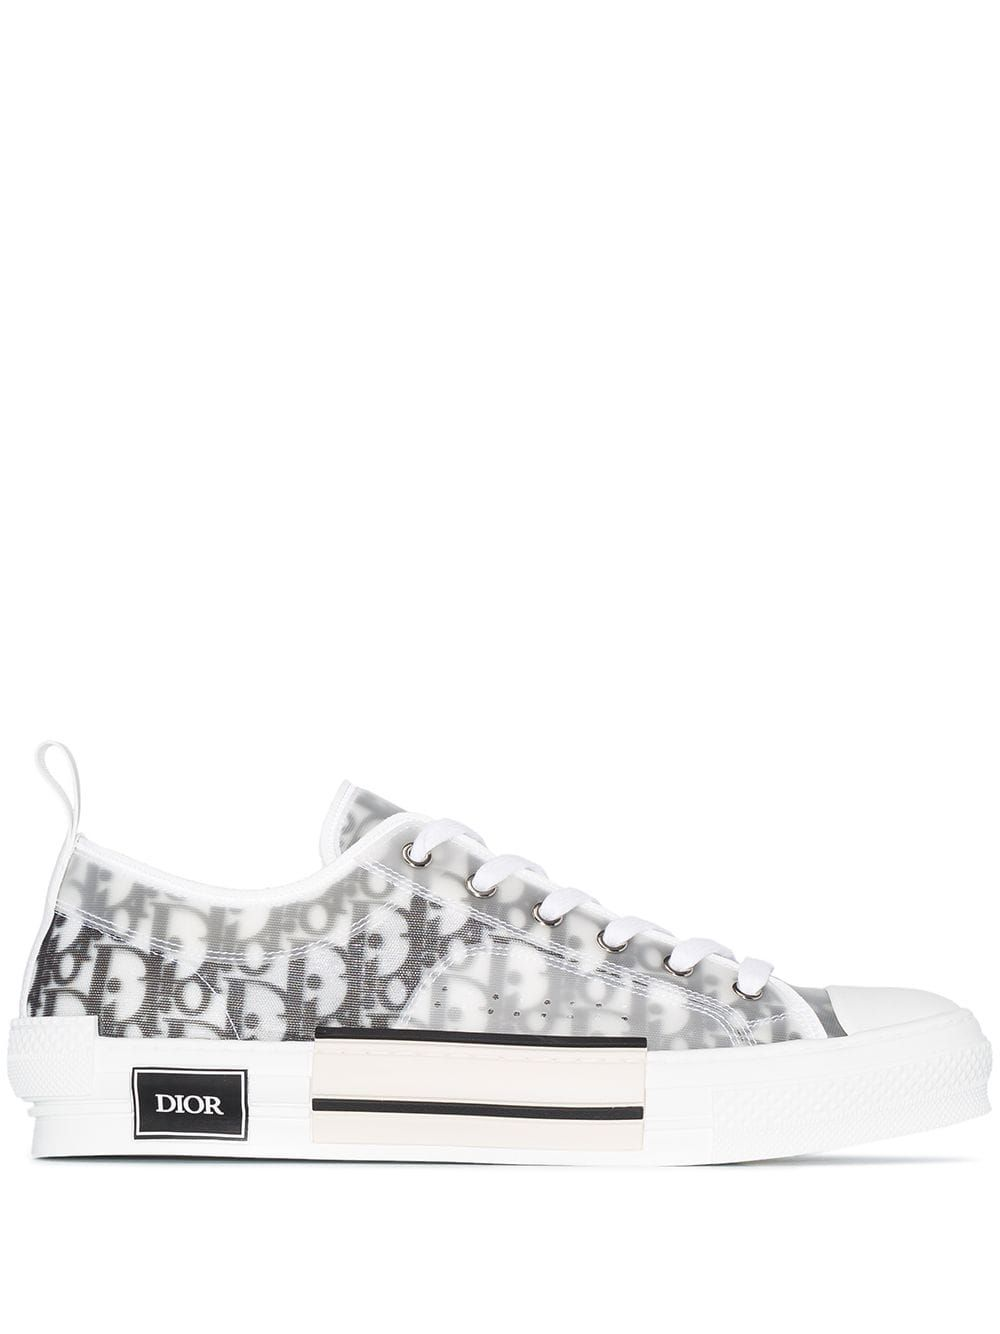 dior sneakers farfetch off 64% - www